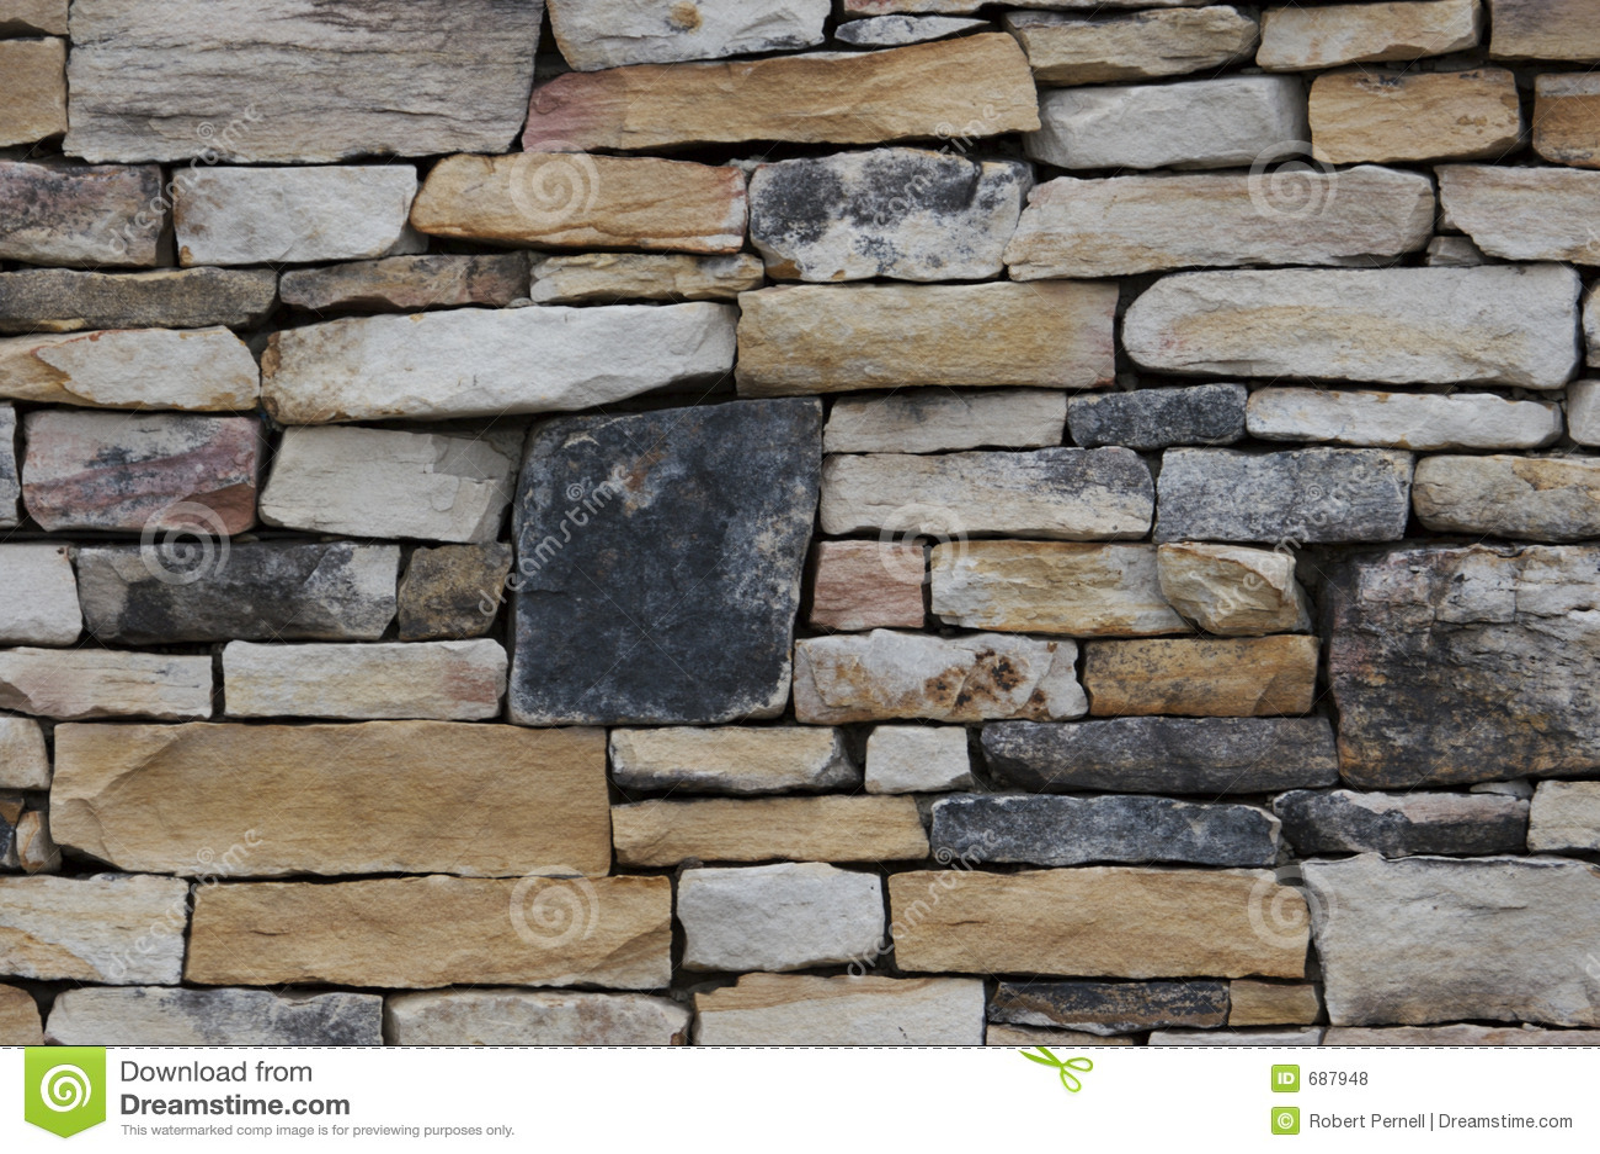 rock wall stock photo image of solid granite natural 687948. Black Bedroom Furniture Sets. Home Design Ideas